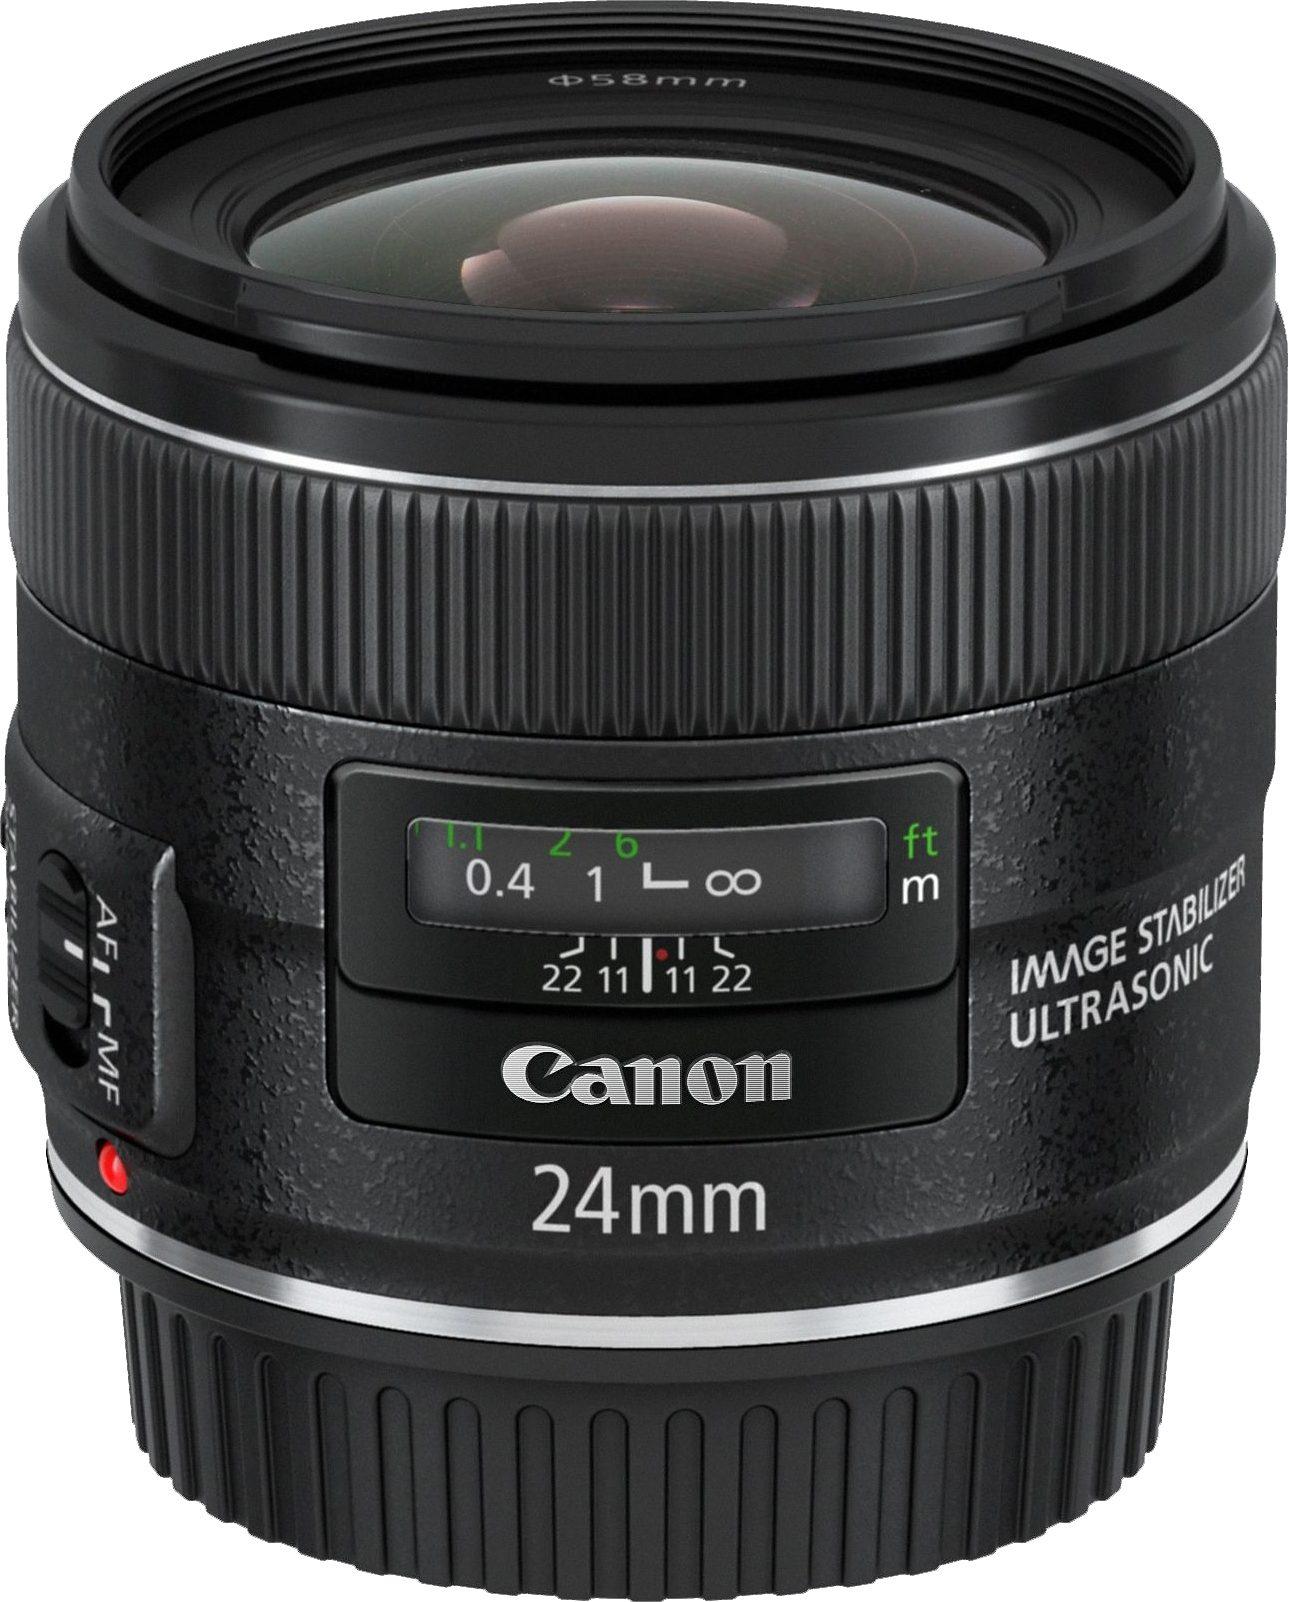 Canon EF 24mm f/2.8 IS USM Weitwinkel Objektiv